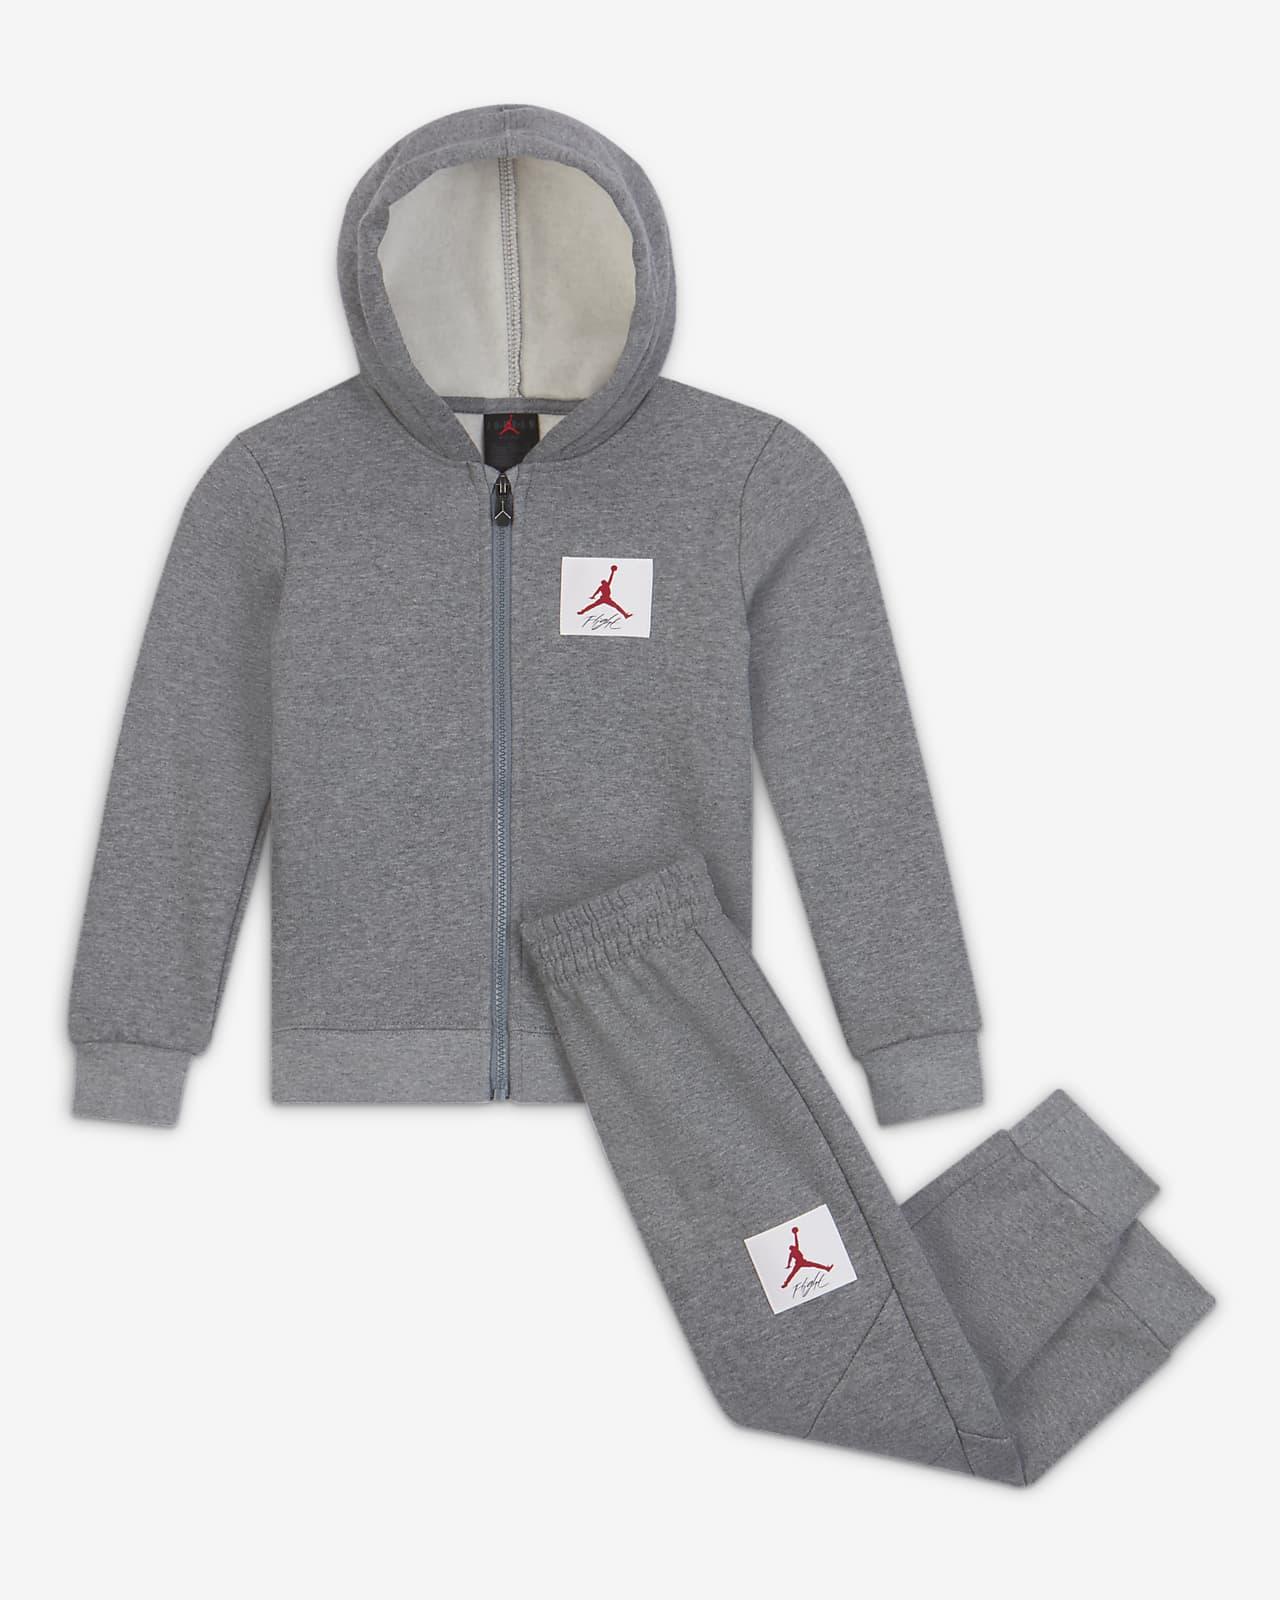 Jordan Toddler Zip Hoodie and Pants Set